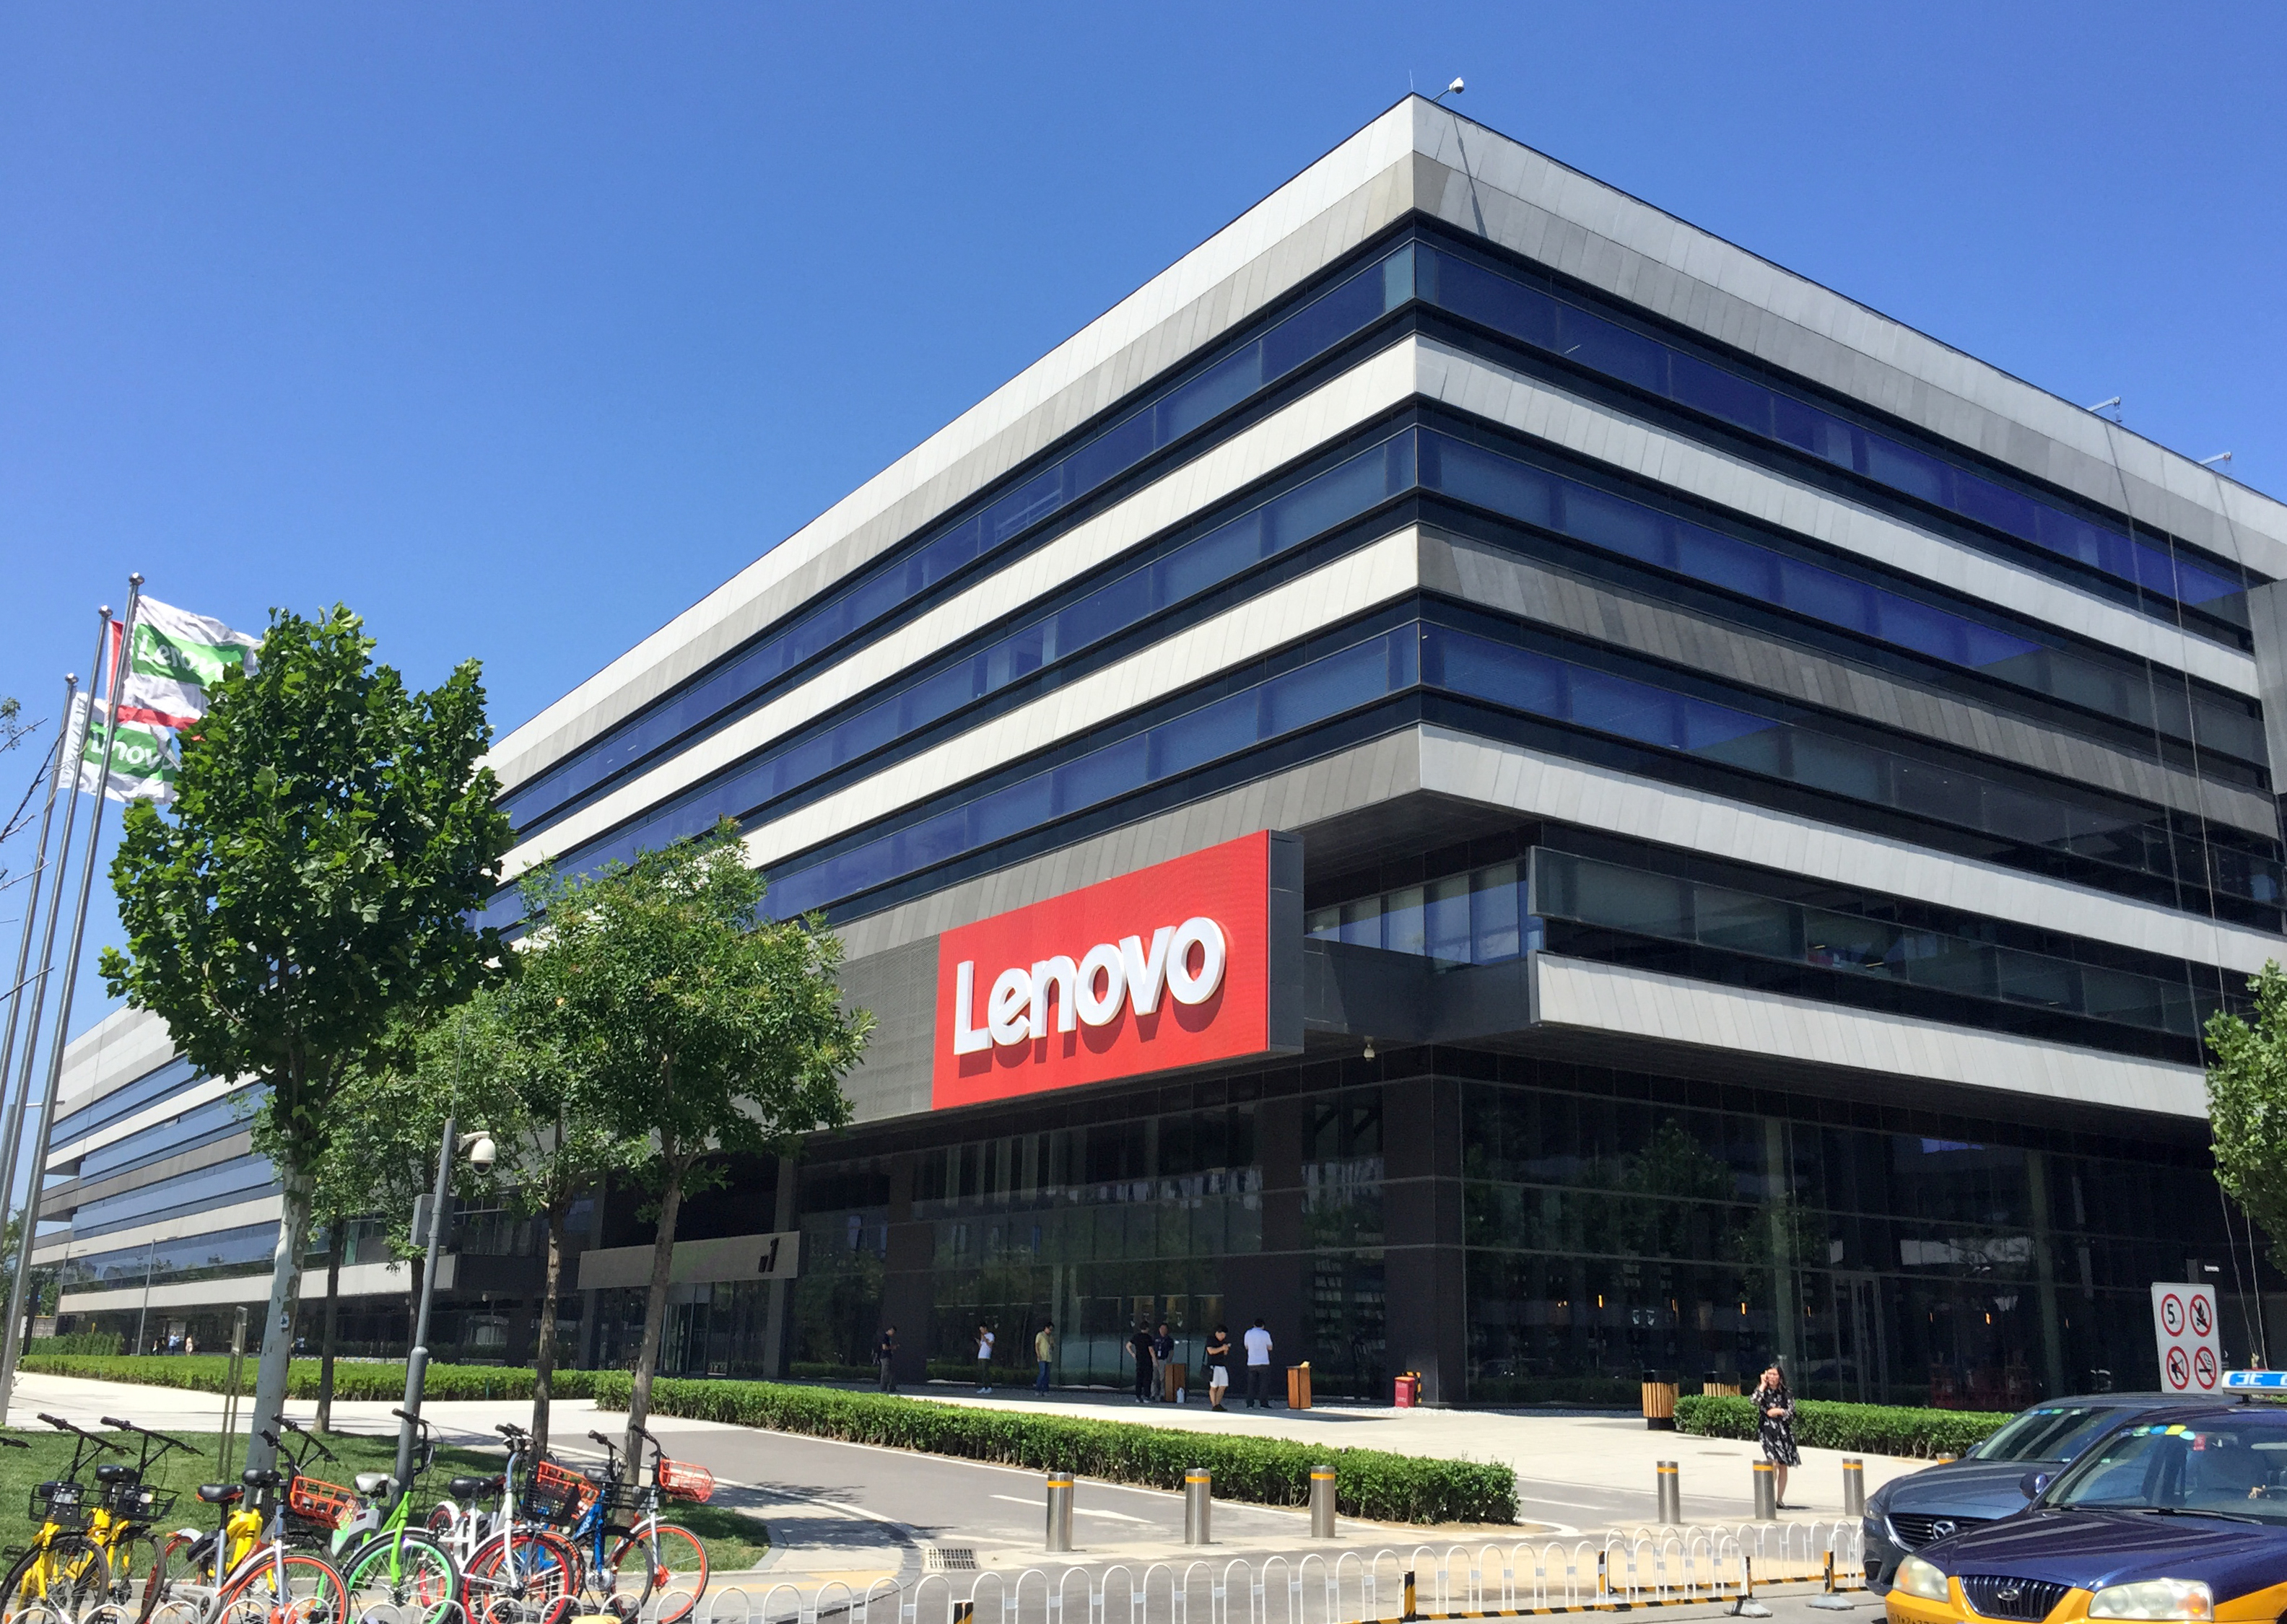 Lenovo - Wikipedia